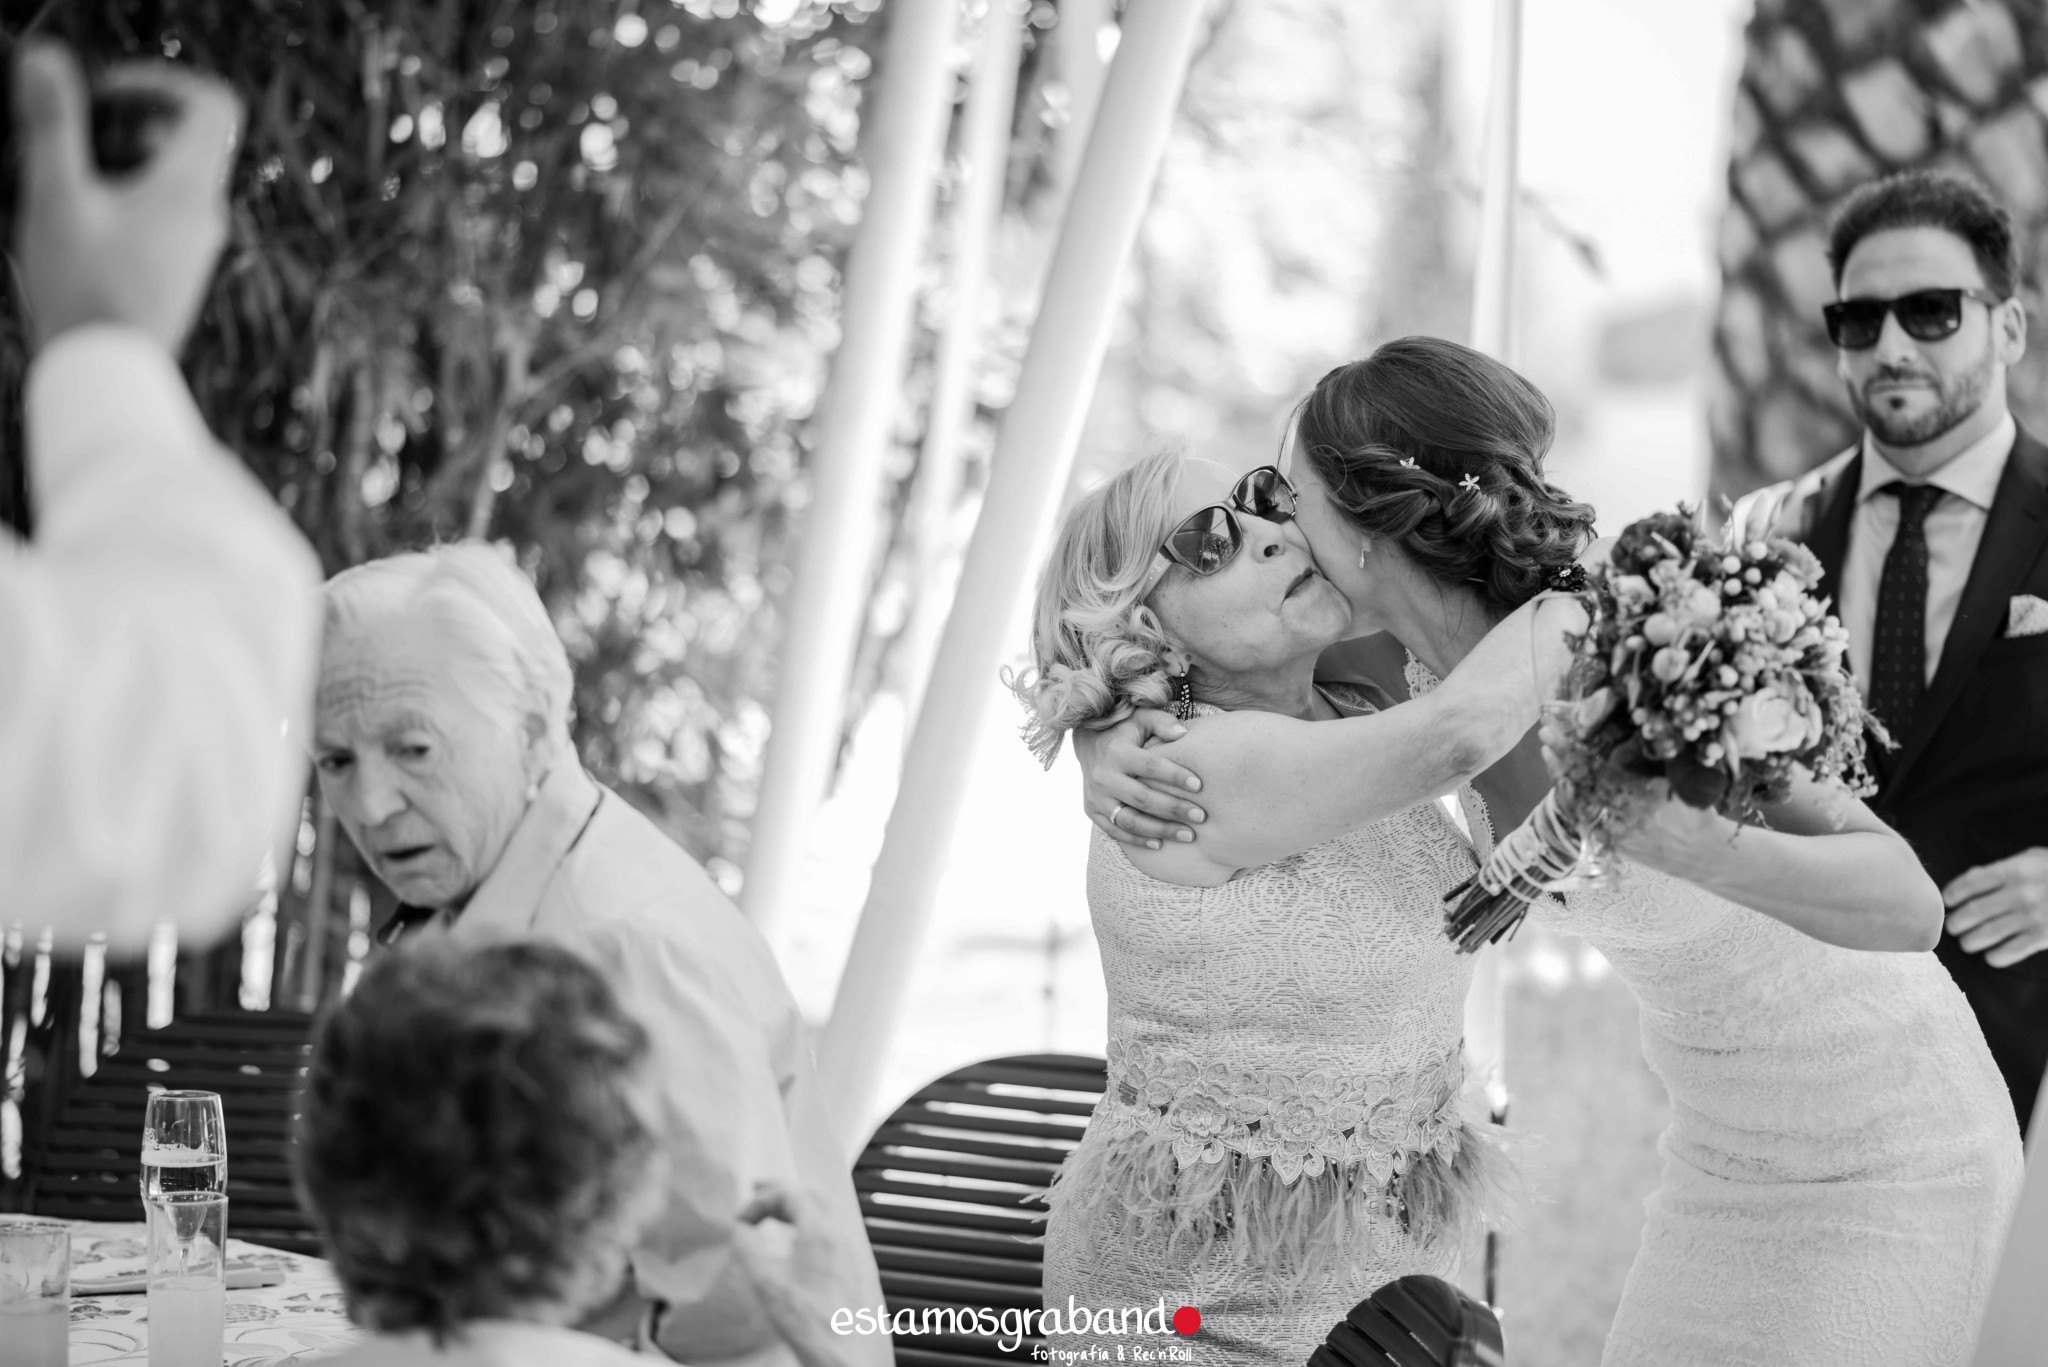 LEO-Y-PEDRO-46 Fotografía de Boda_Leo & Pedro [Jardines de la Mamunia, Granada] - video boda cadiz